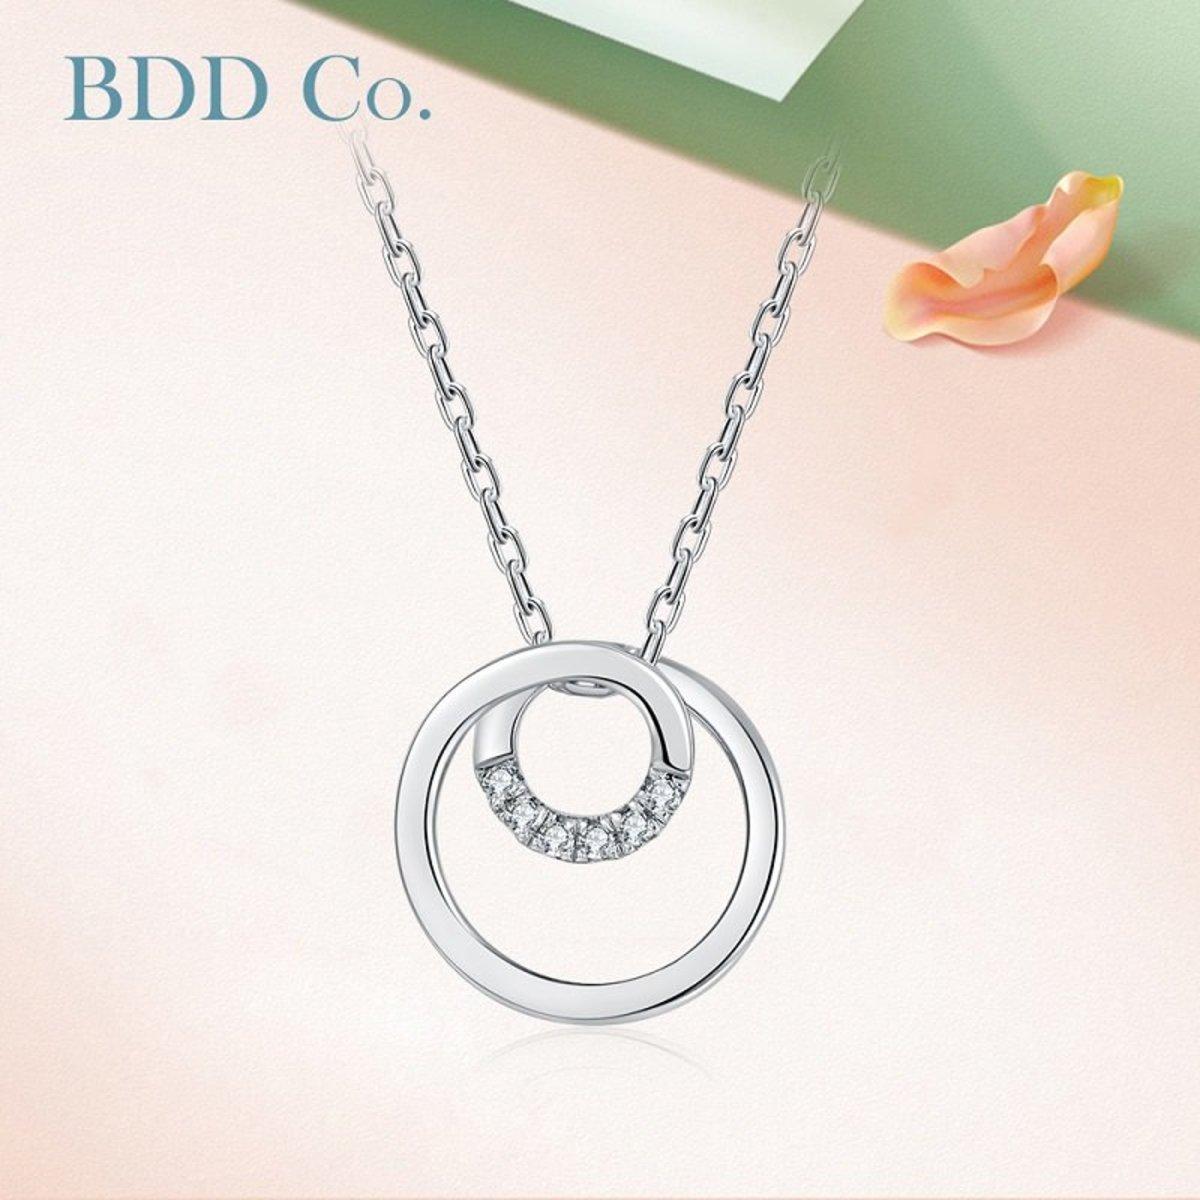 【BDD-Co.】18k白金 纏繞圓環鑽石項鏈